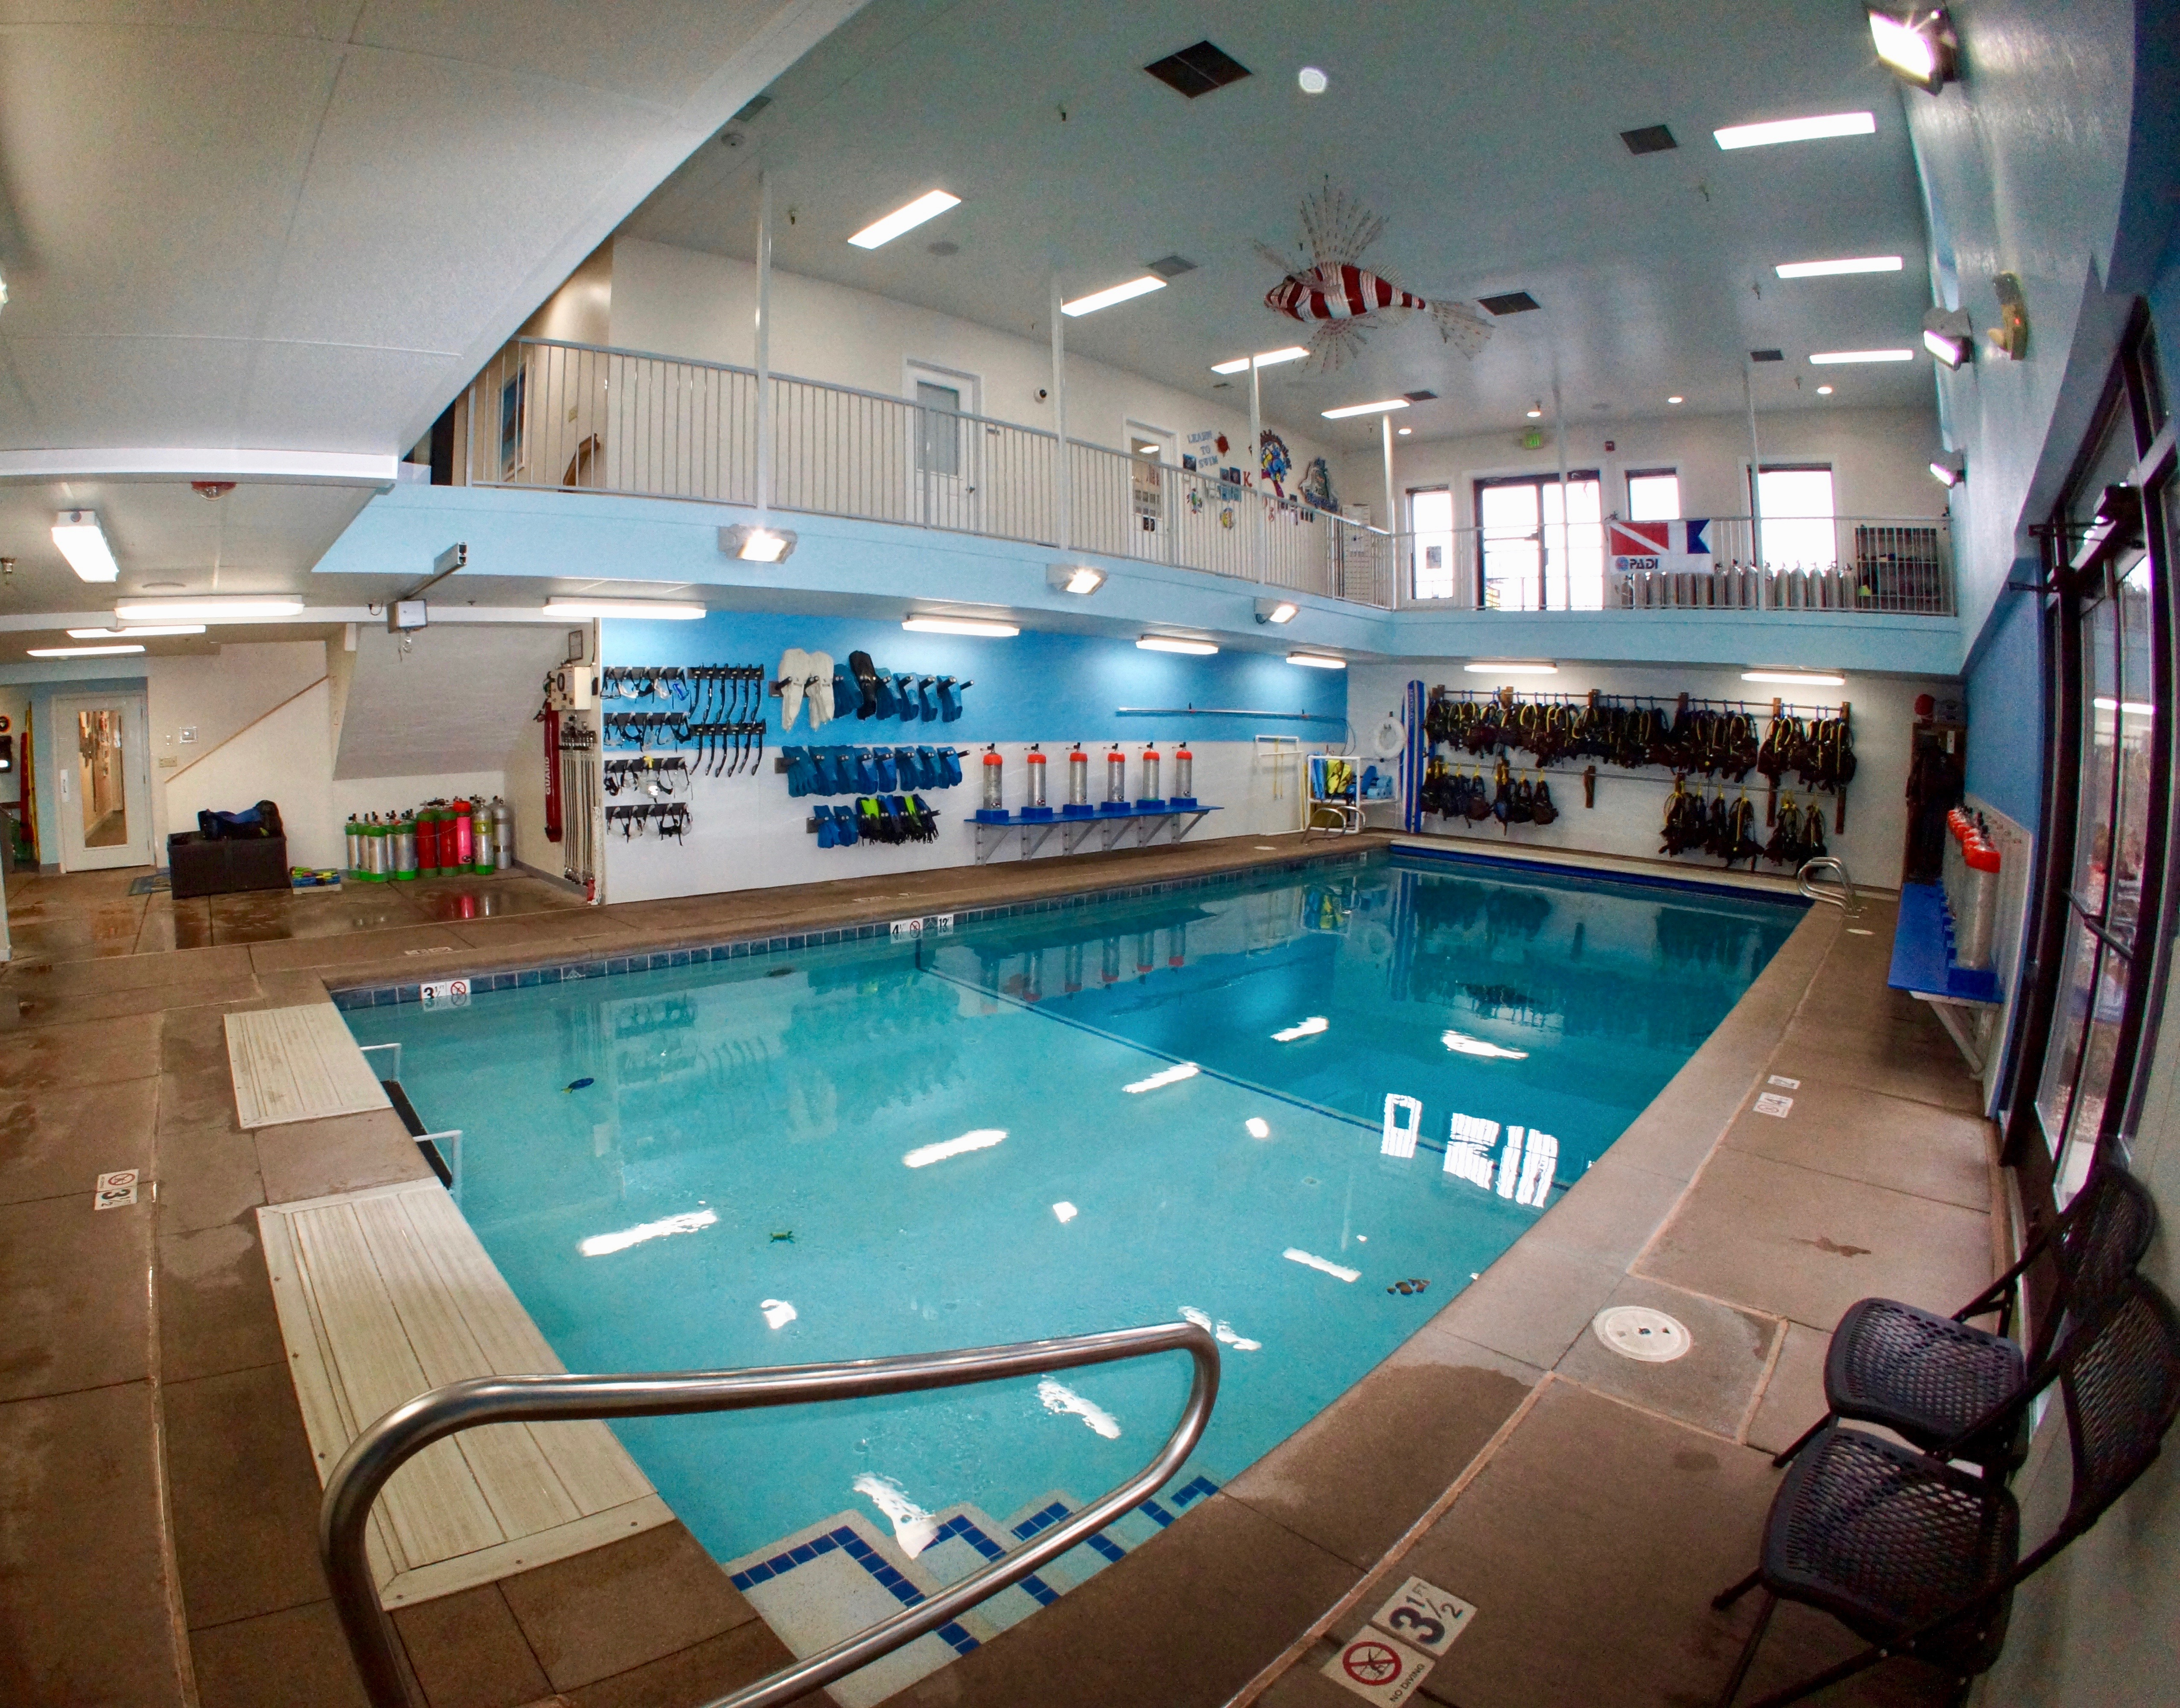 A-1 Scuba Pool